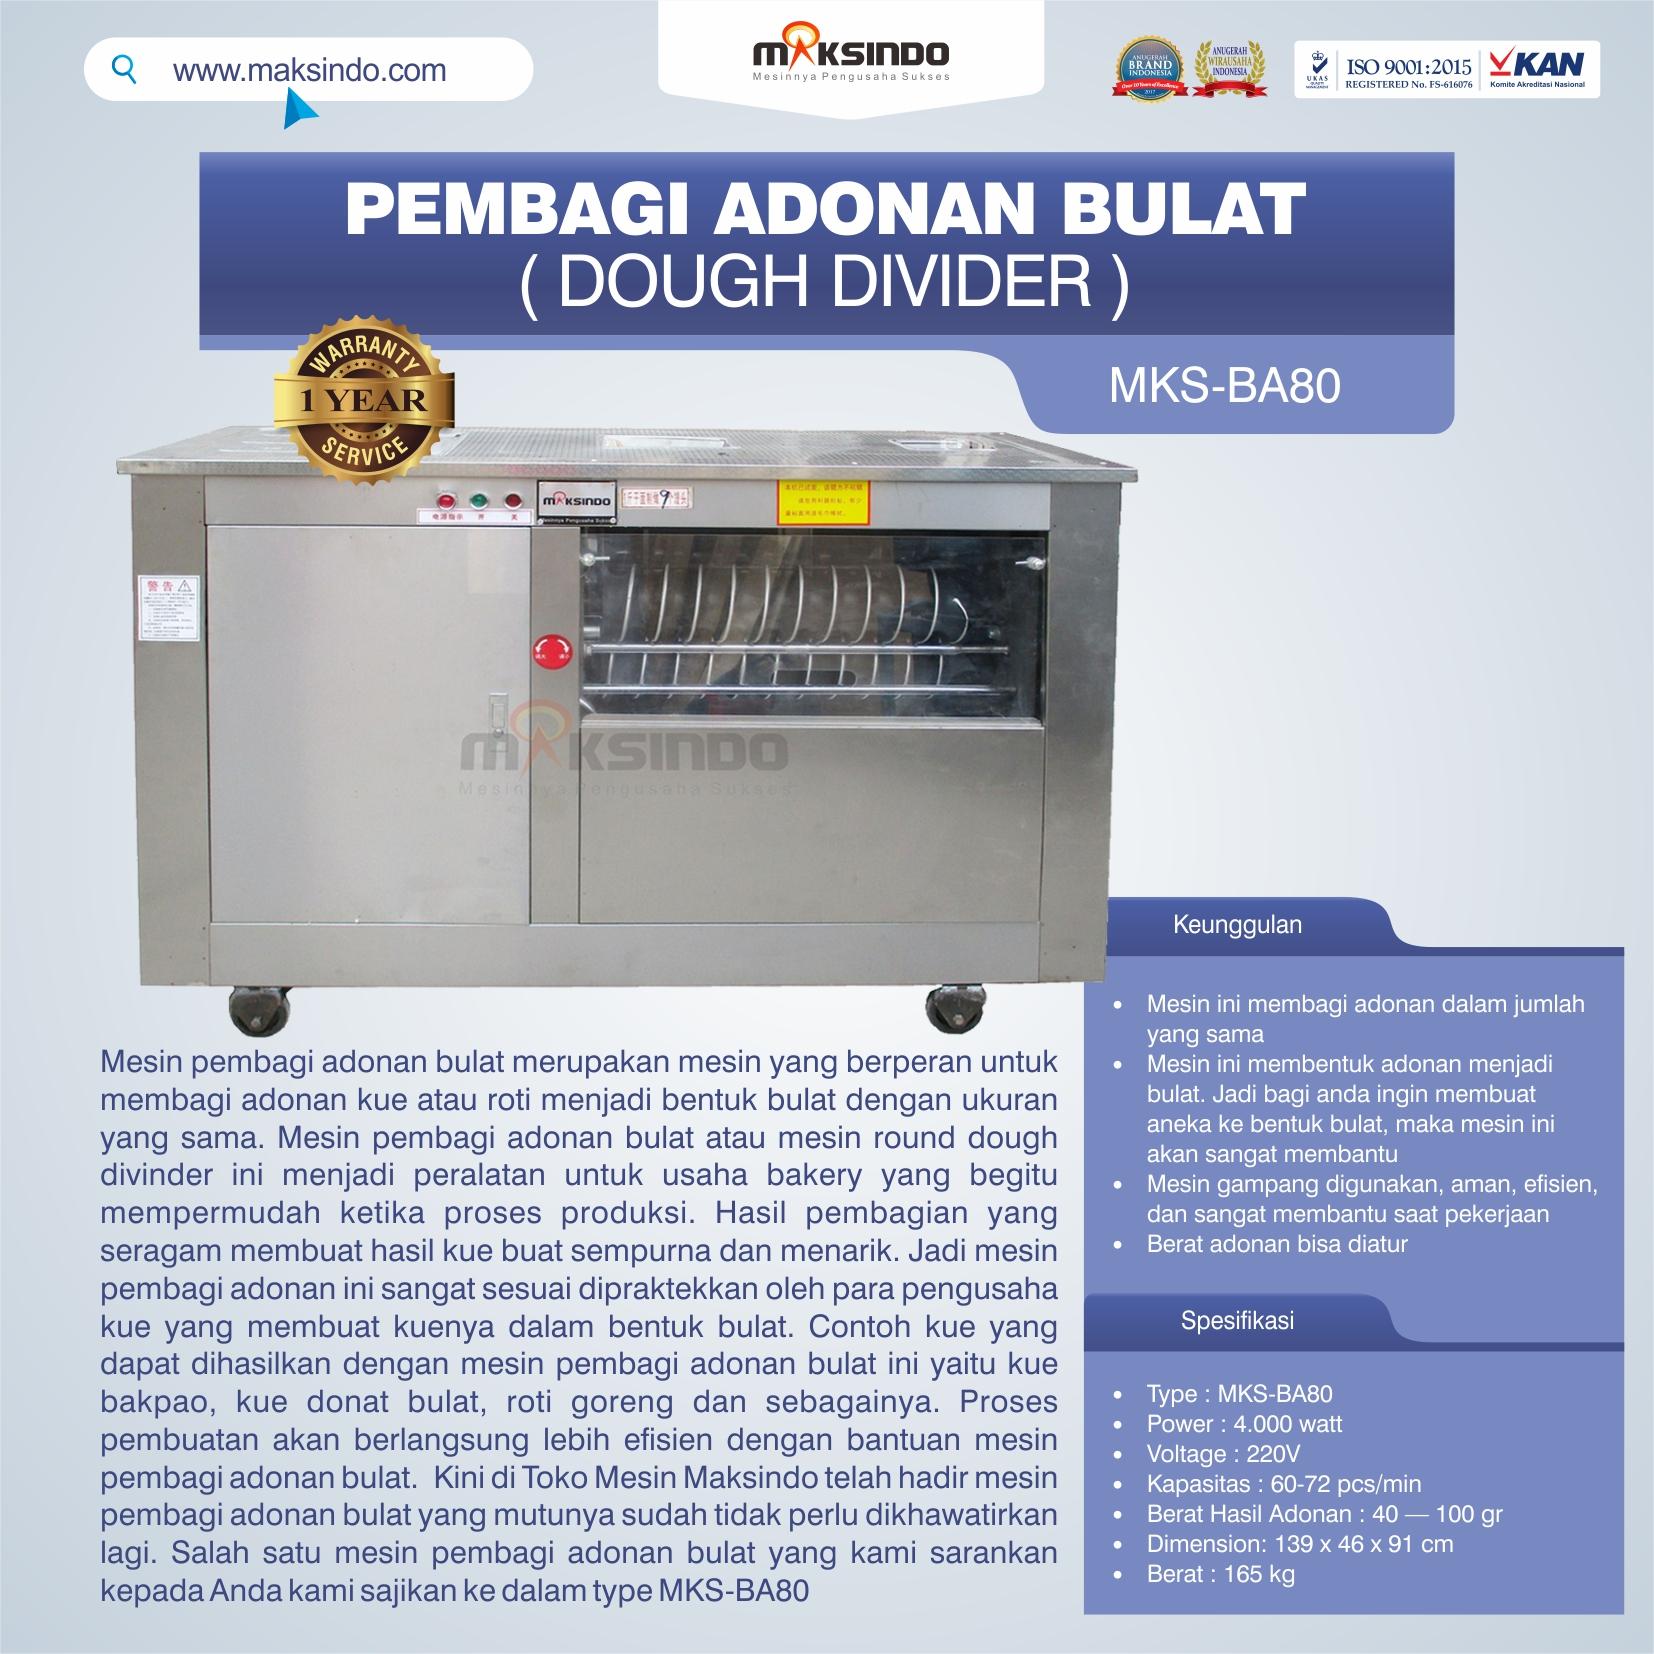 Jual Pembagi Adonan Bulat (Dough Divider) MKS-BA80 di Yogyakarta